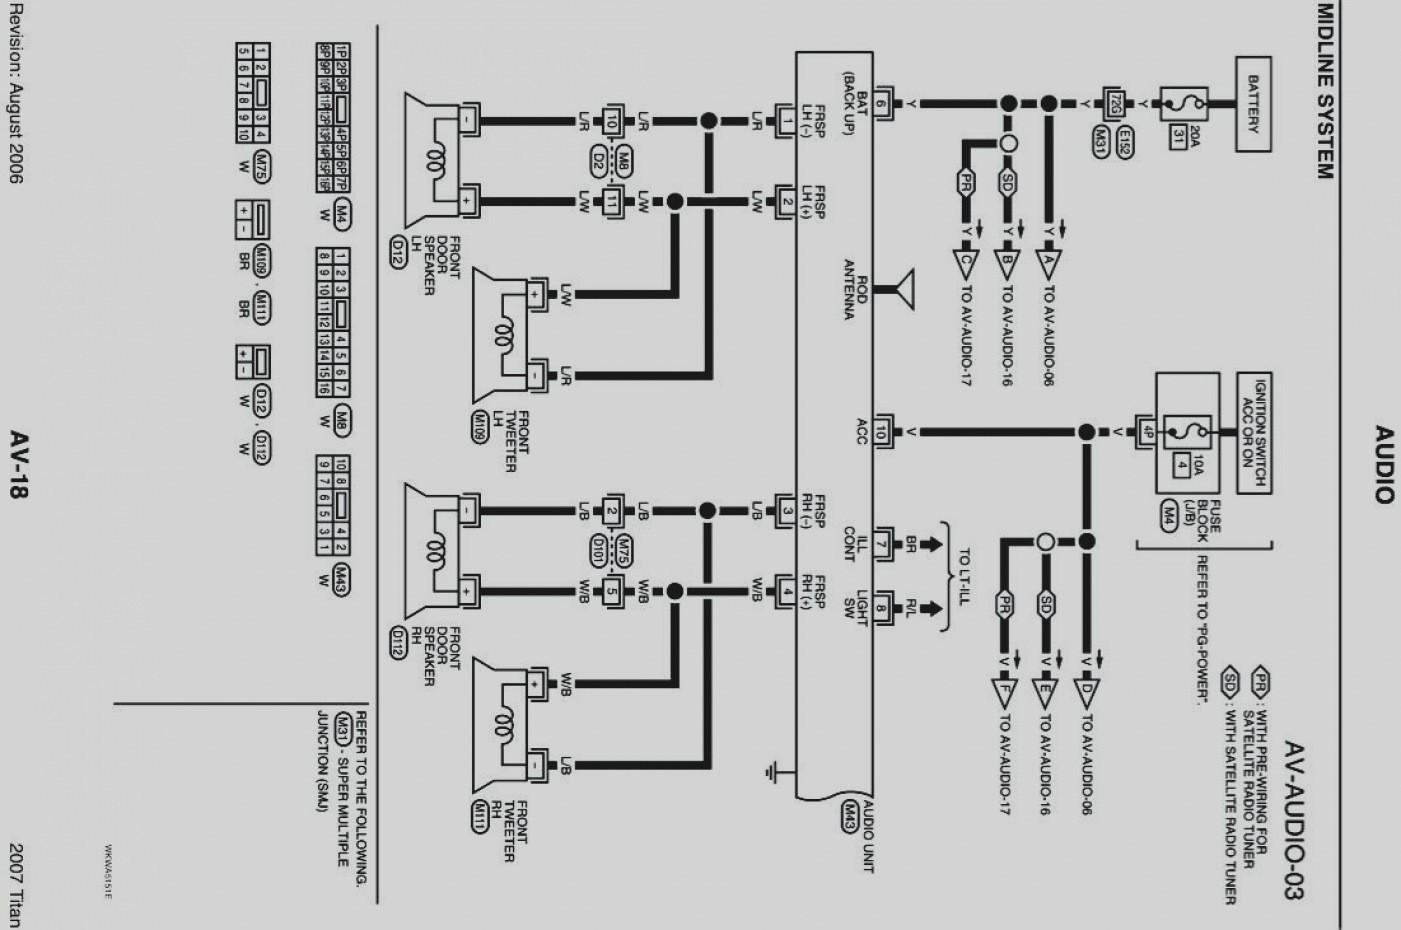 wiring diagram nissan armada simple wiring diagram Nissan Titan Wire Harness nissan armada wiring diagram wiring diagram lexus rx350 wiring diagram nissan armada trailer wiring harness wiring